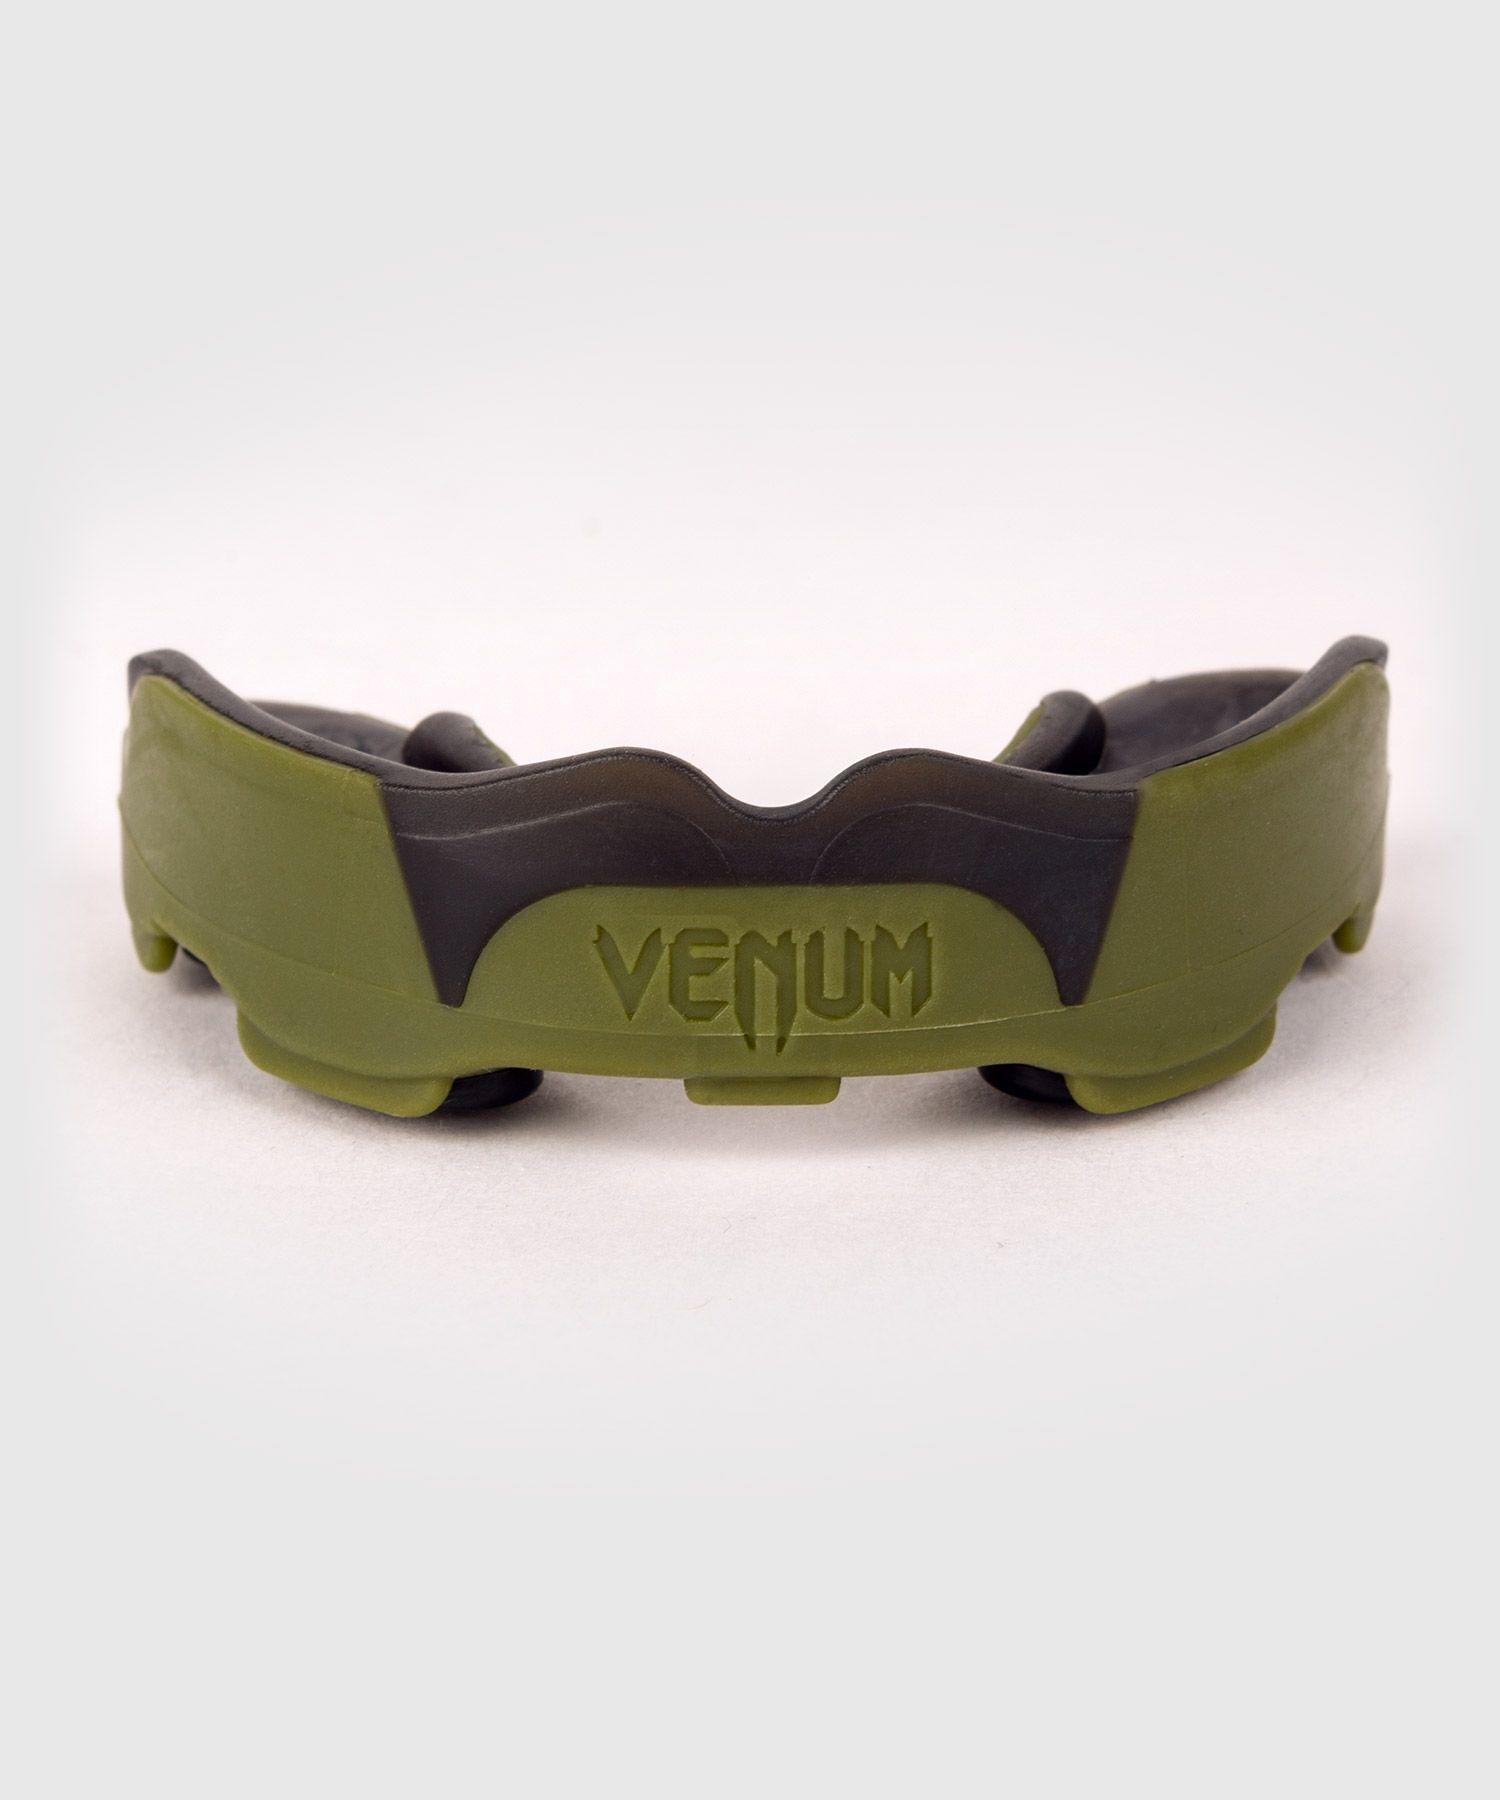 Venum Predator Mundschutz - Khaki/Schwarz